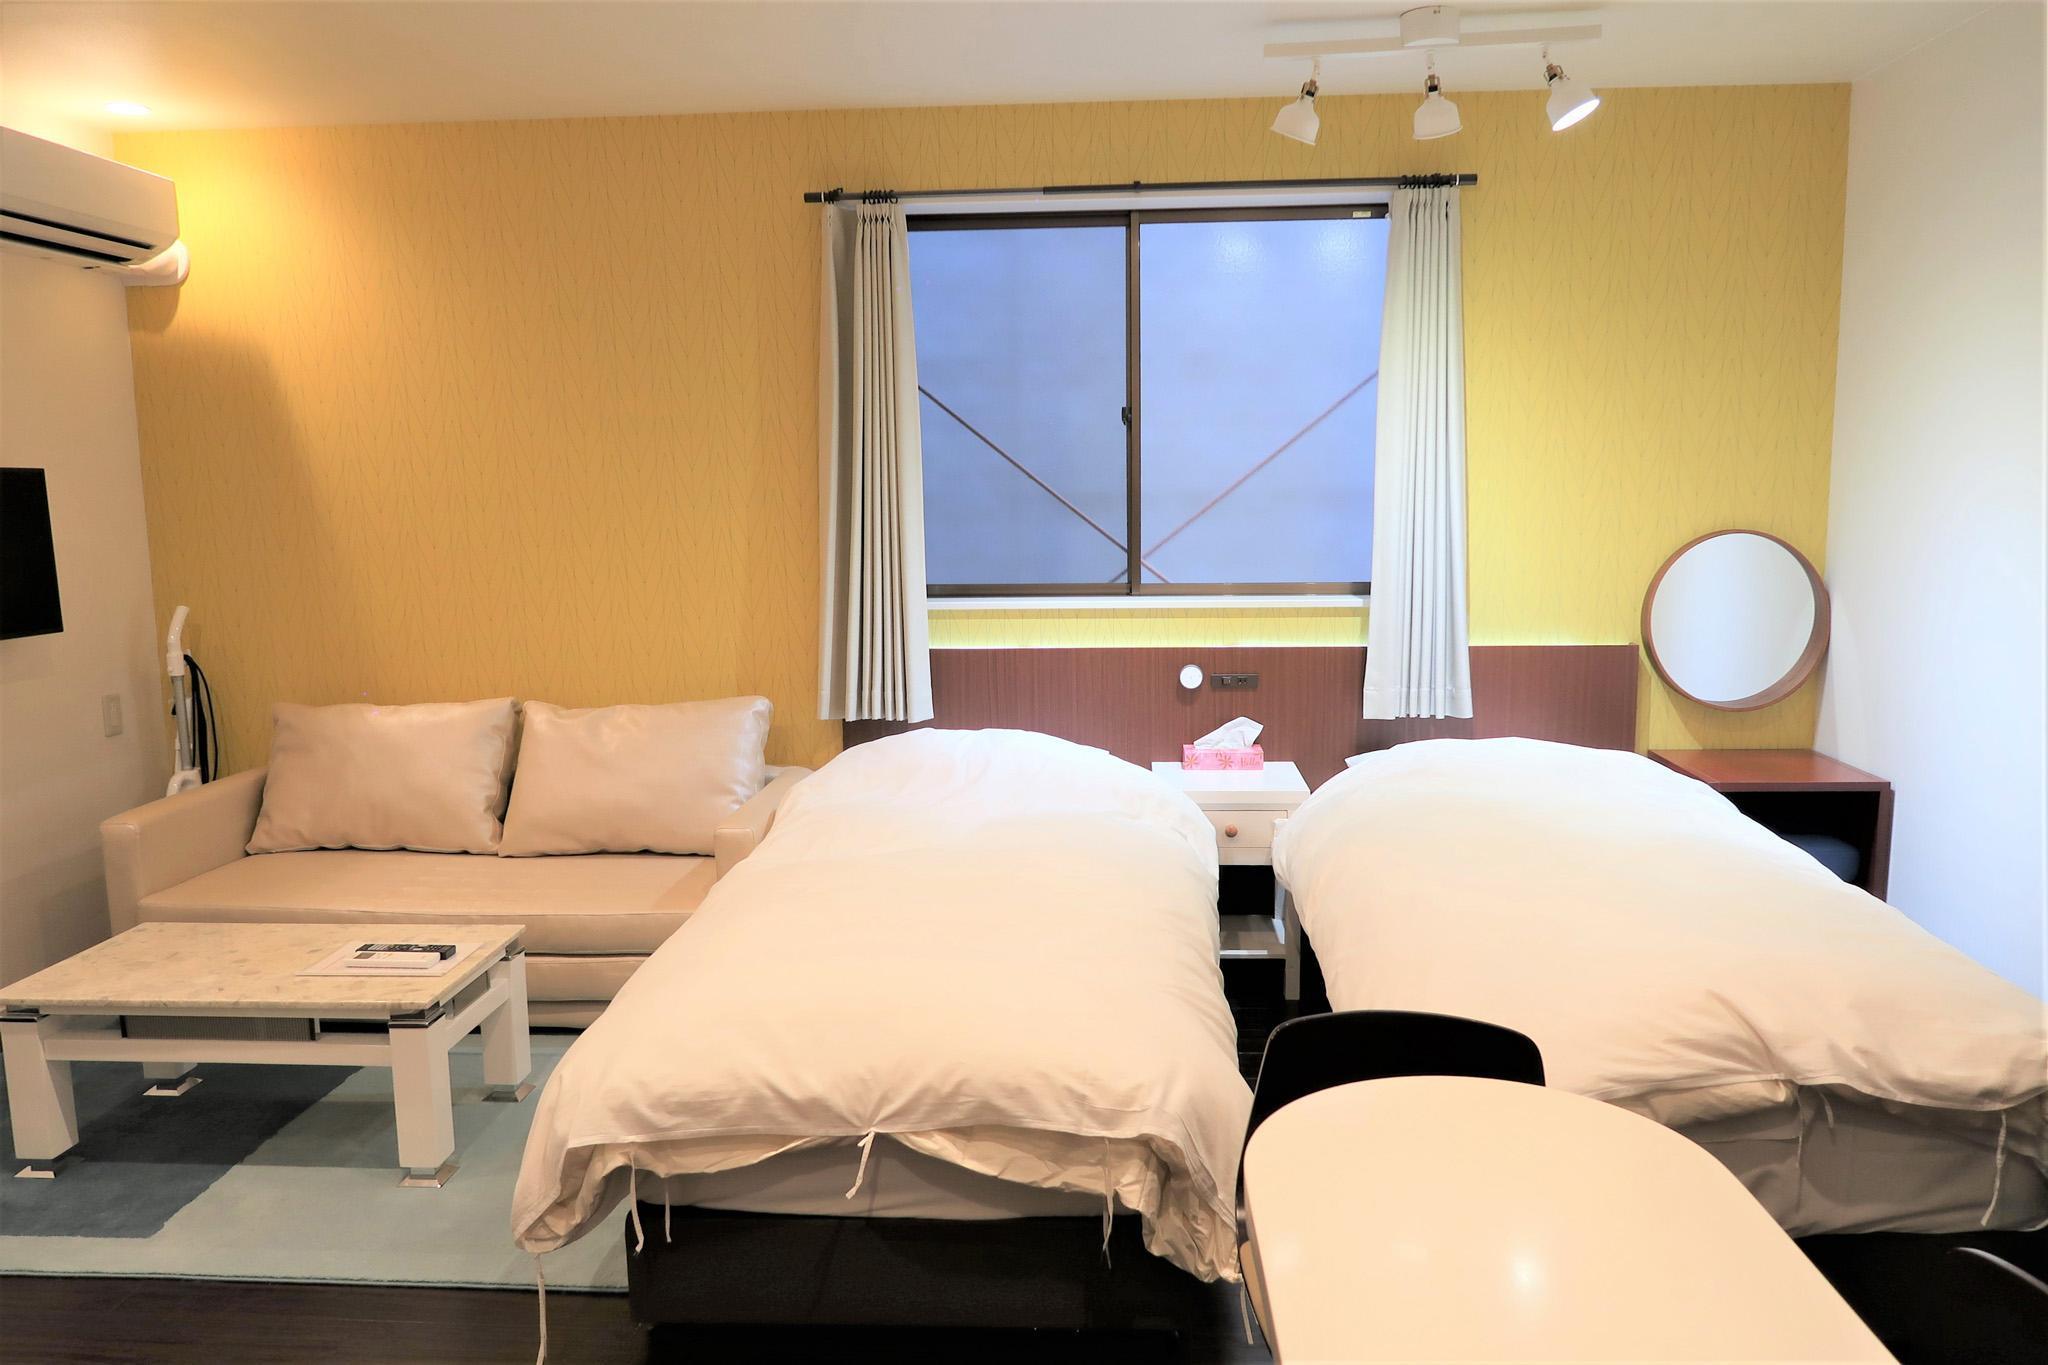 TAMADE SAKURA HOUSE Studio Apartment Oosaka 105